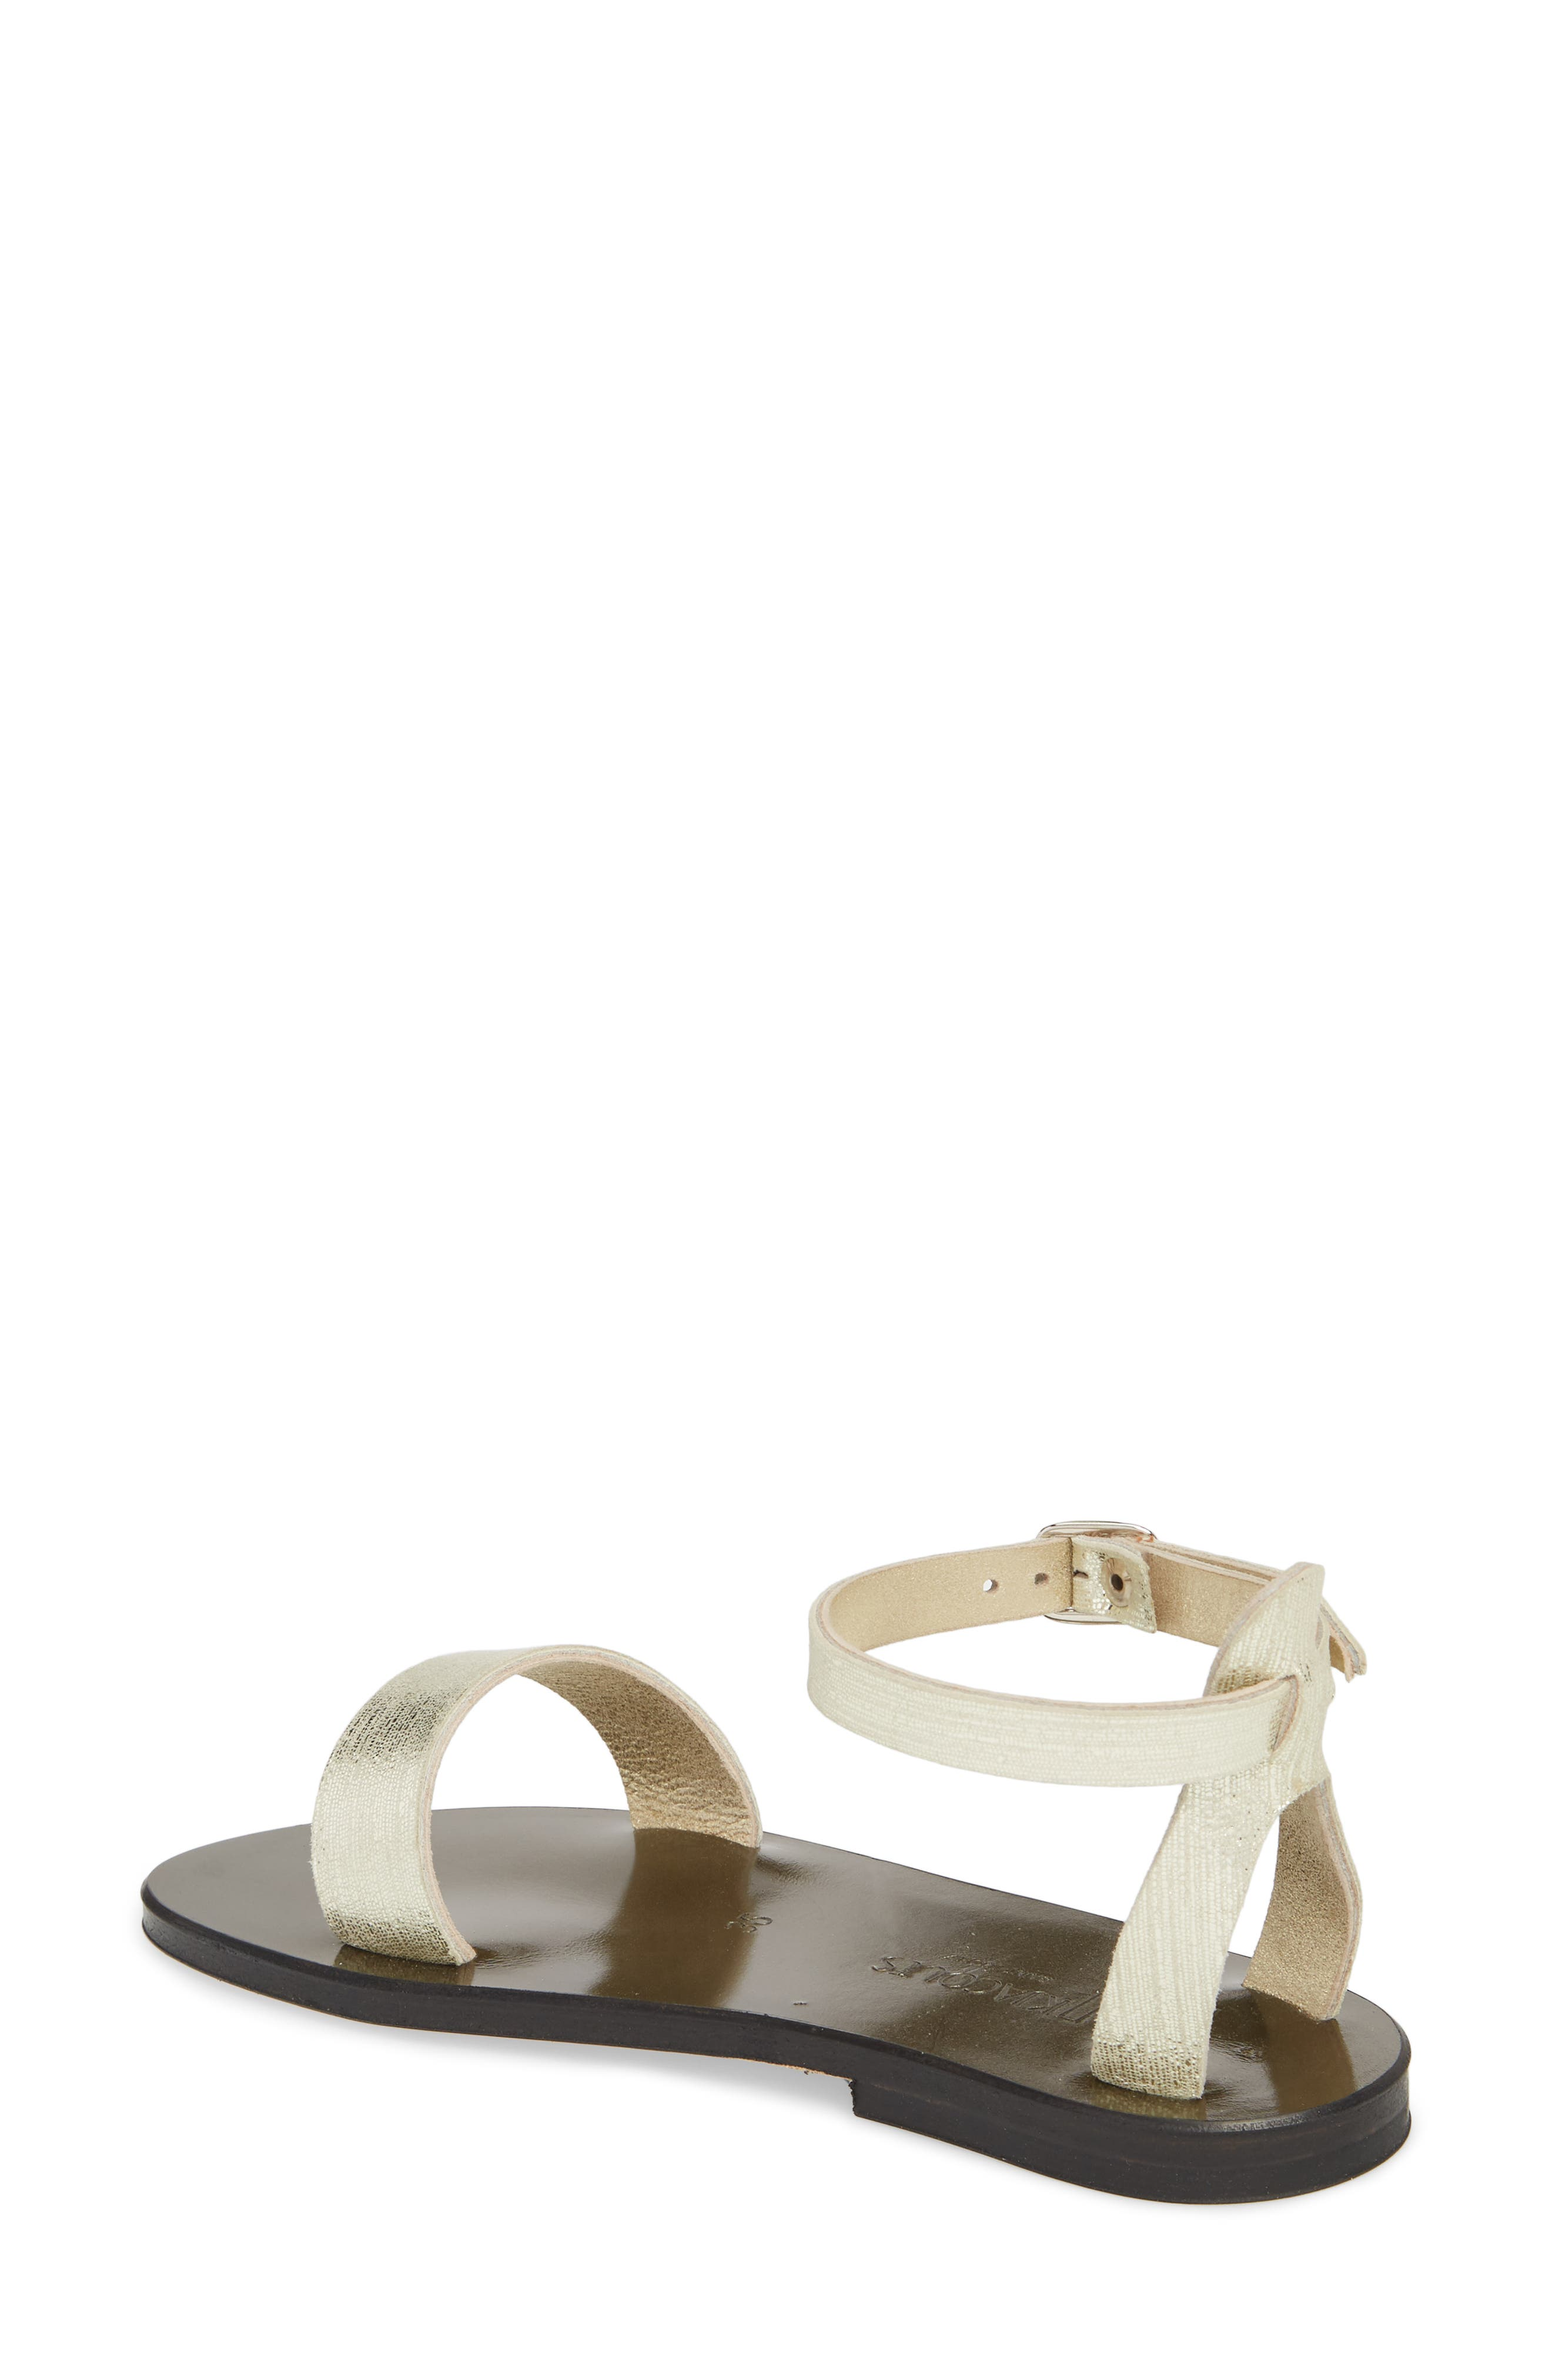 Pampa Sandal,                             Alternate thumbnail 2, color,                             Blonde / Platine Leather